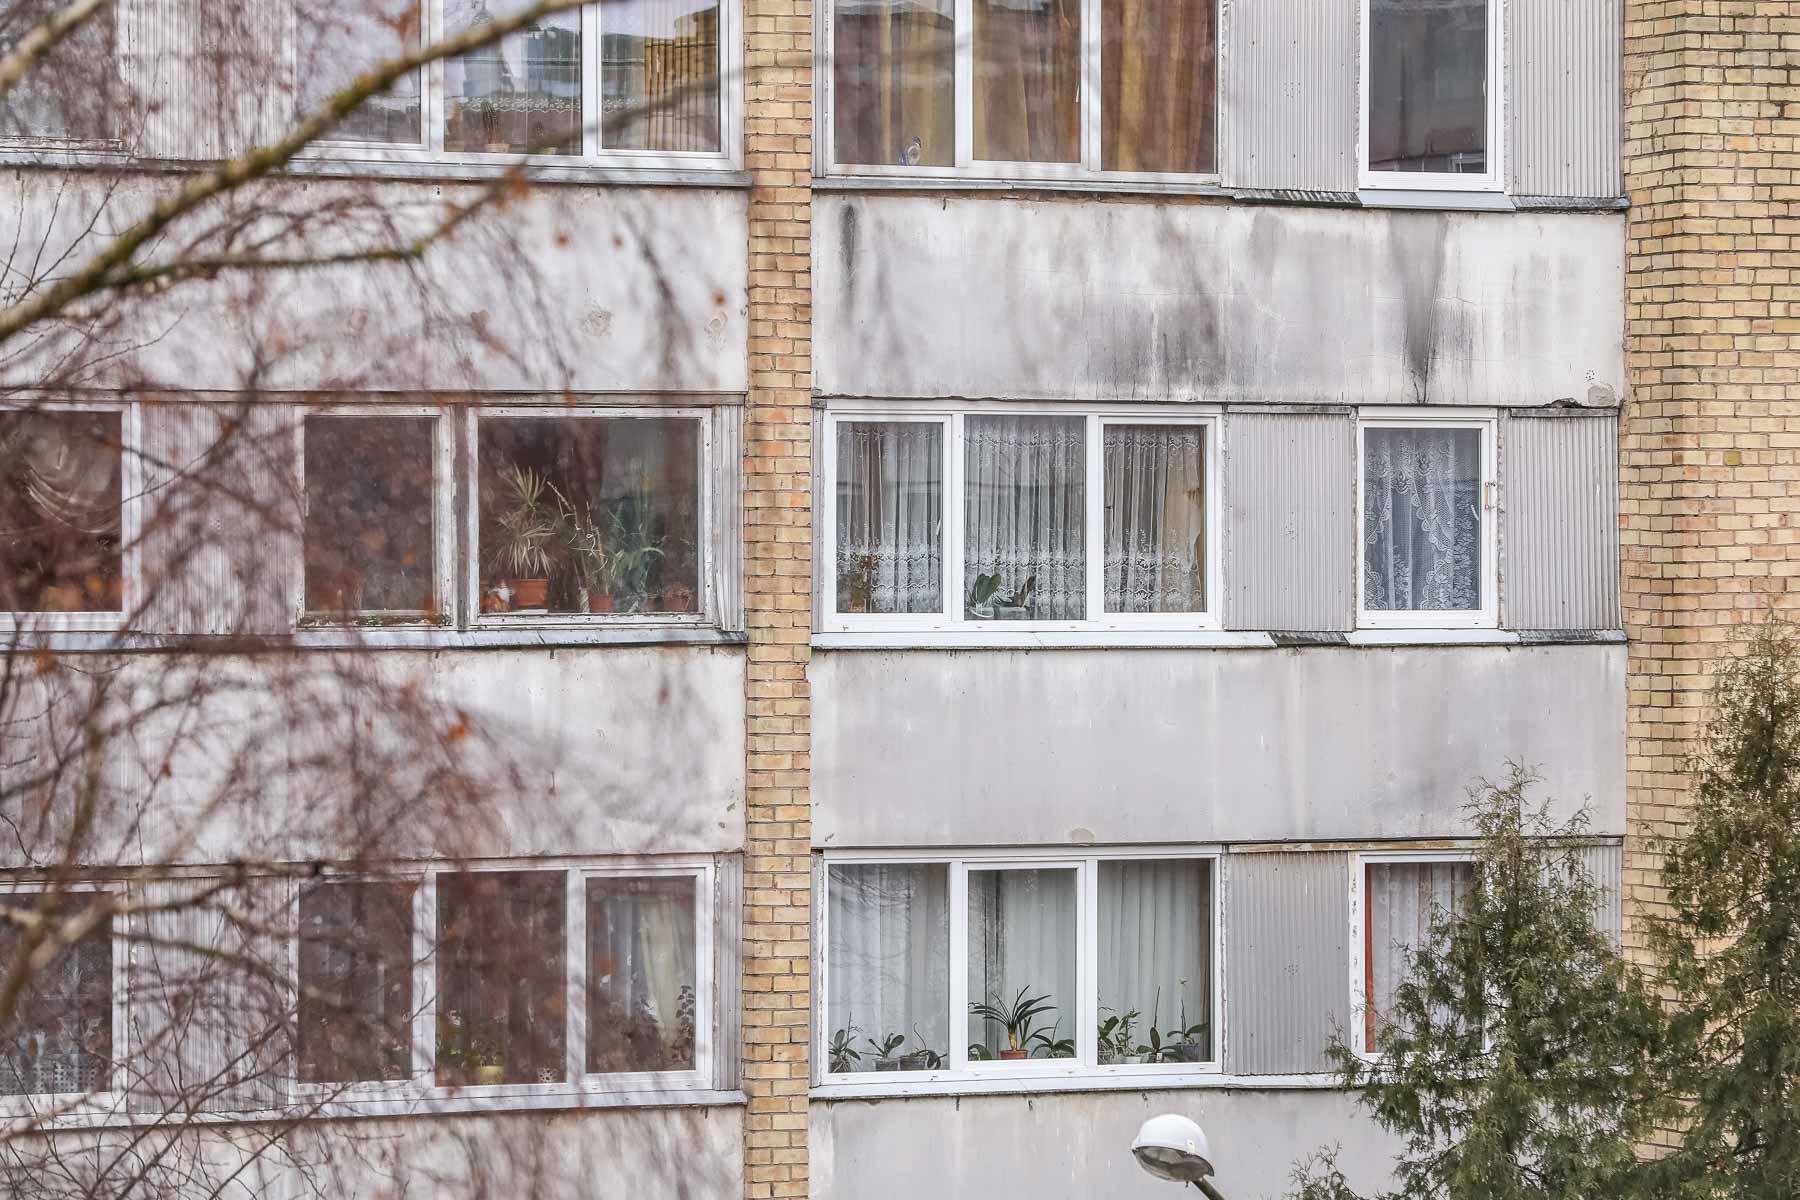 Landscape-cityscape-photography-jelgava-latvia-blocs-blocks-flat-post-soviet--Советские-квартиры-спальный-район-Латвия-город-фотограф-natalia-smith-photography-0038.jpg